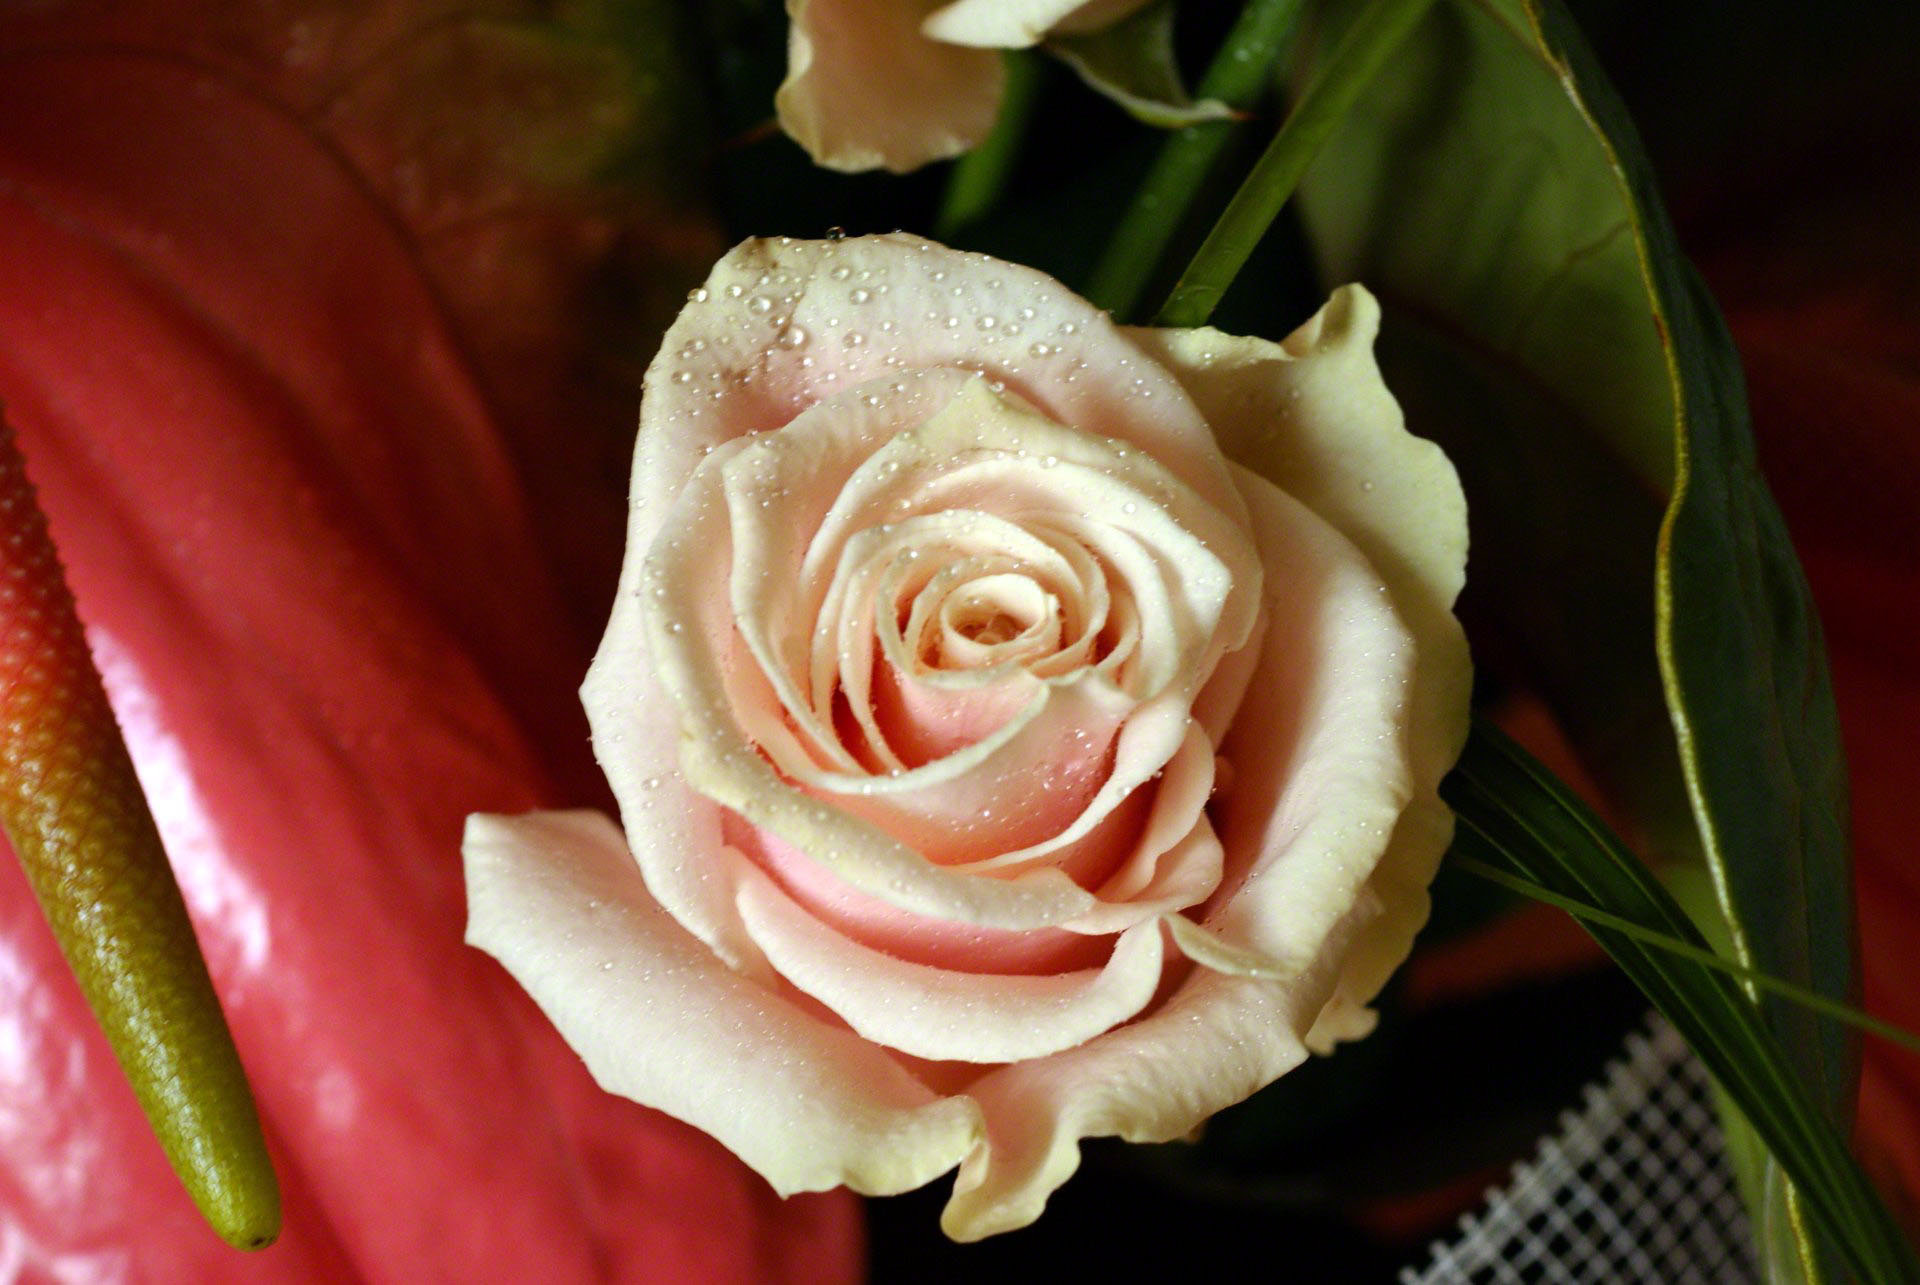 http://www.fabiovisentin.com/photography/photo/12/peach-rose-00856.jpg